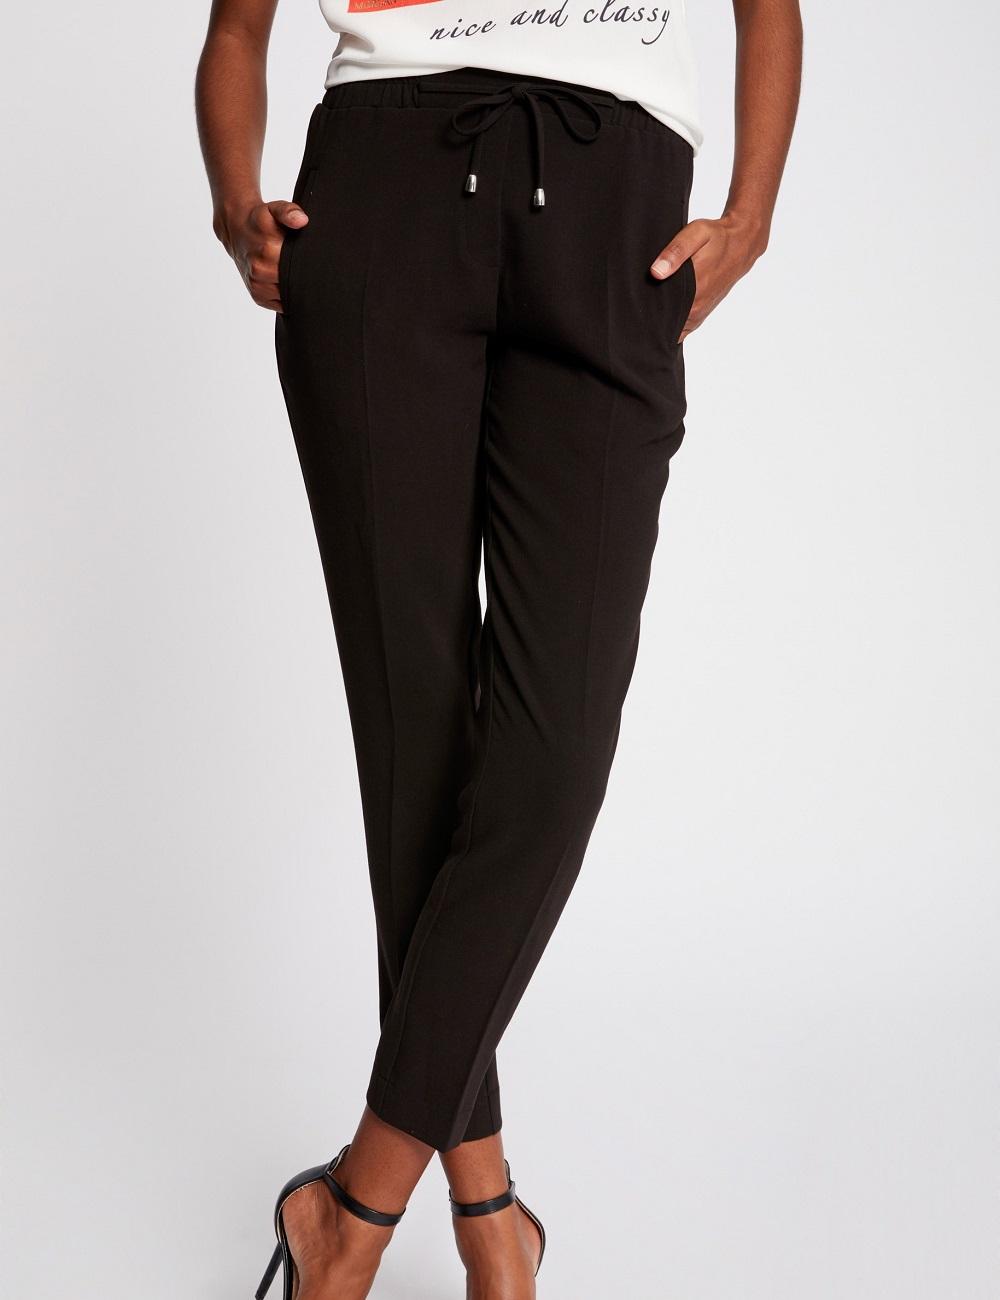 Pantalon 7/8e esprit jogpants Morgan